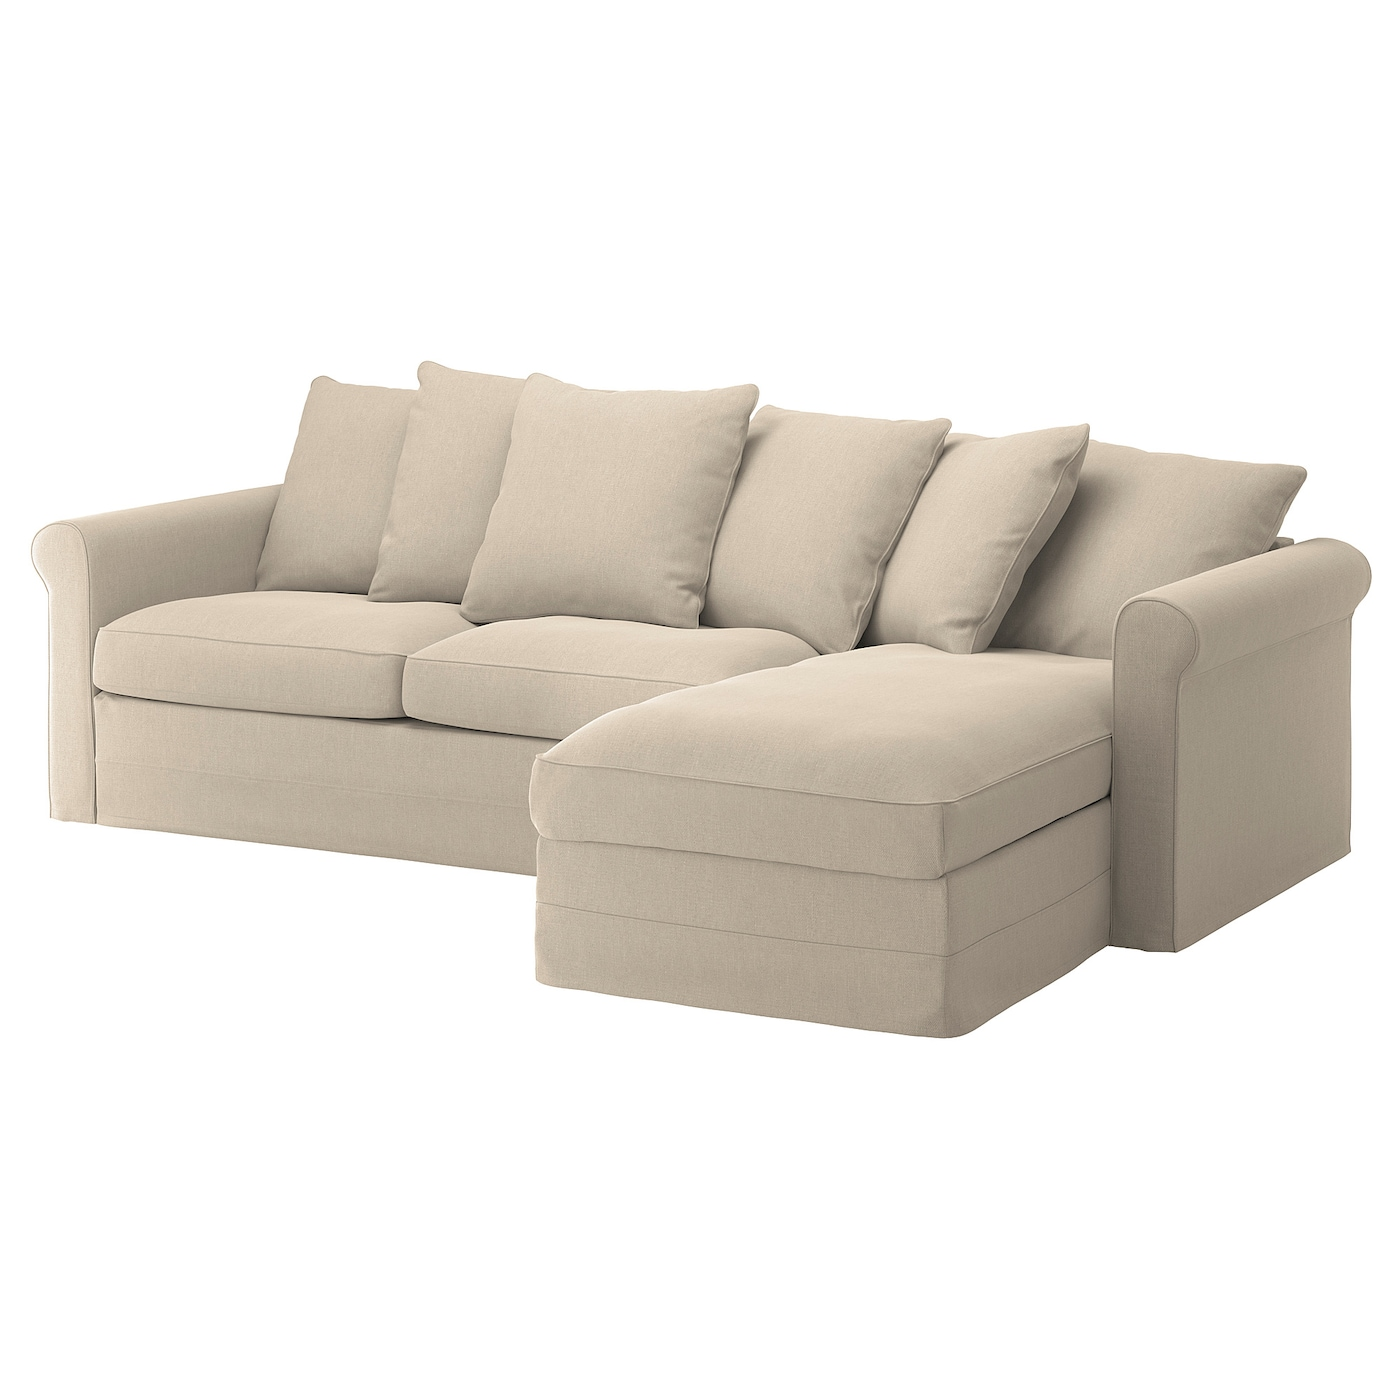 Sleeper sofa GRÖNLID with chaise, Sporda natural